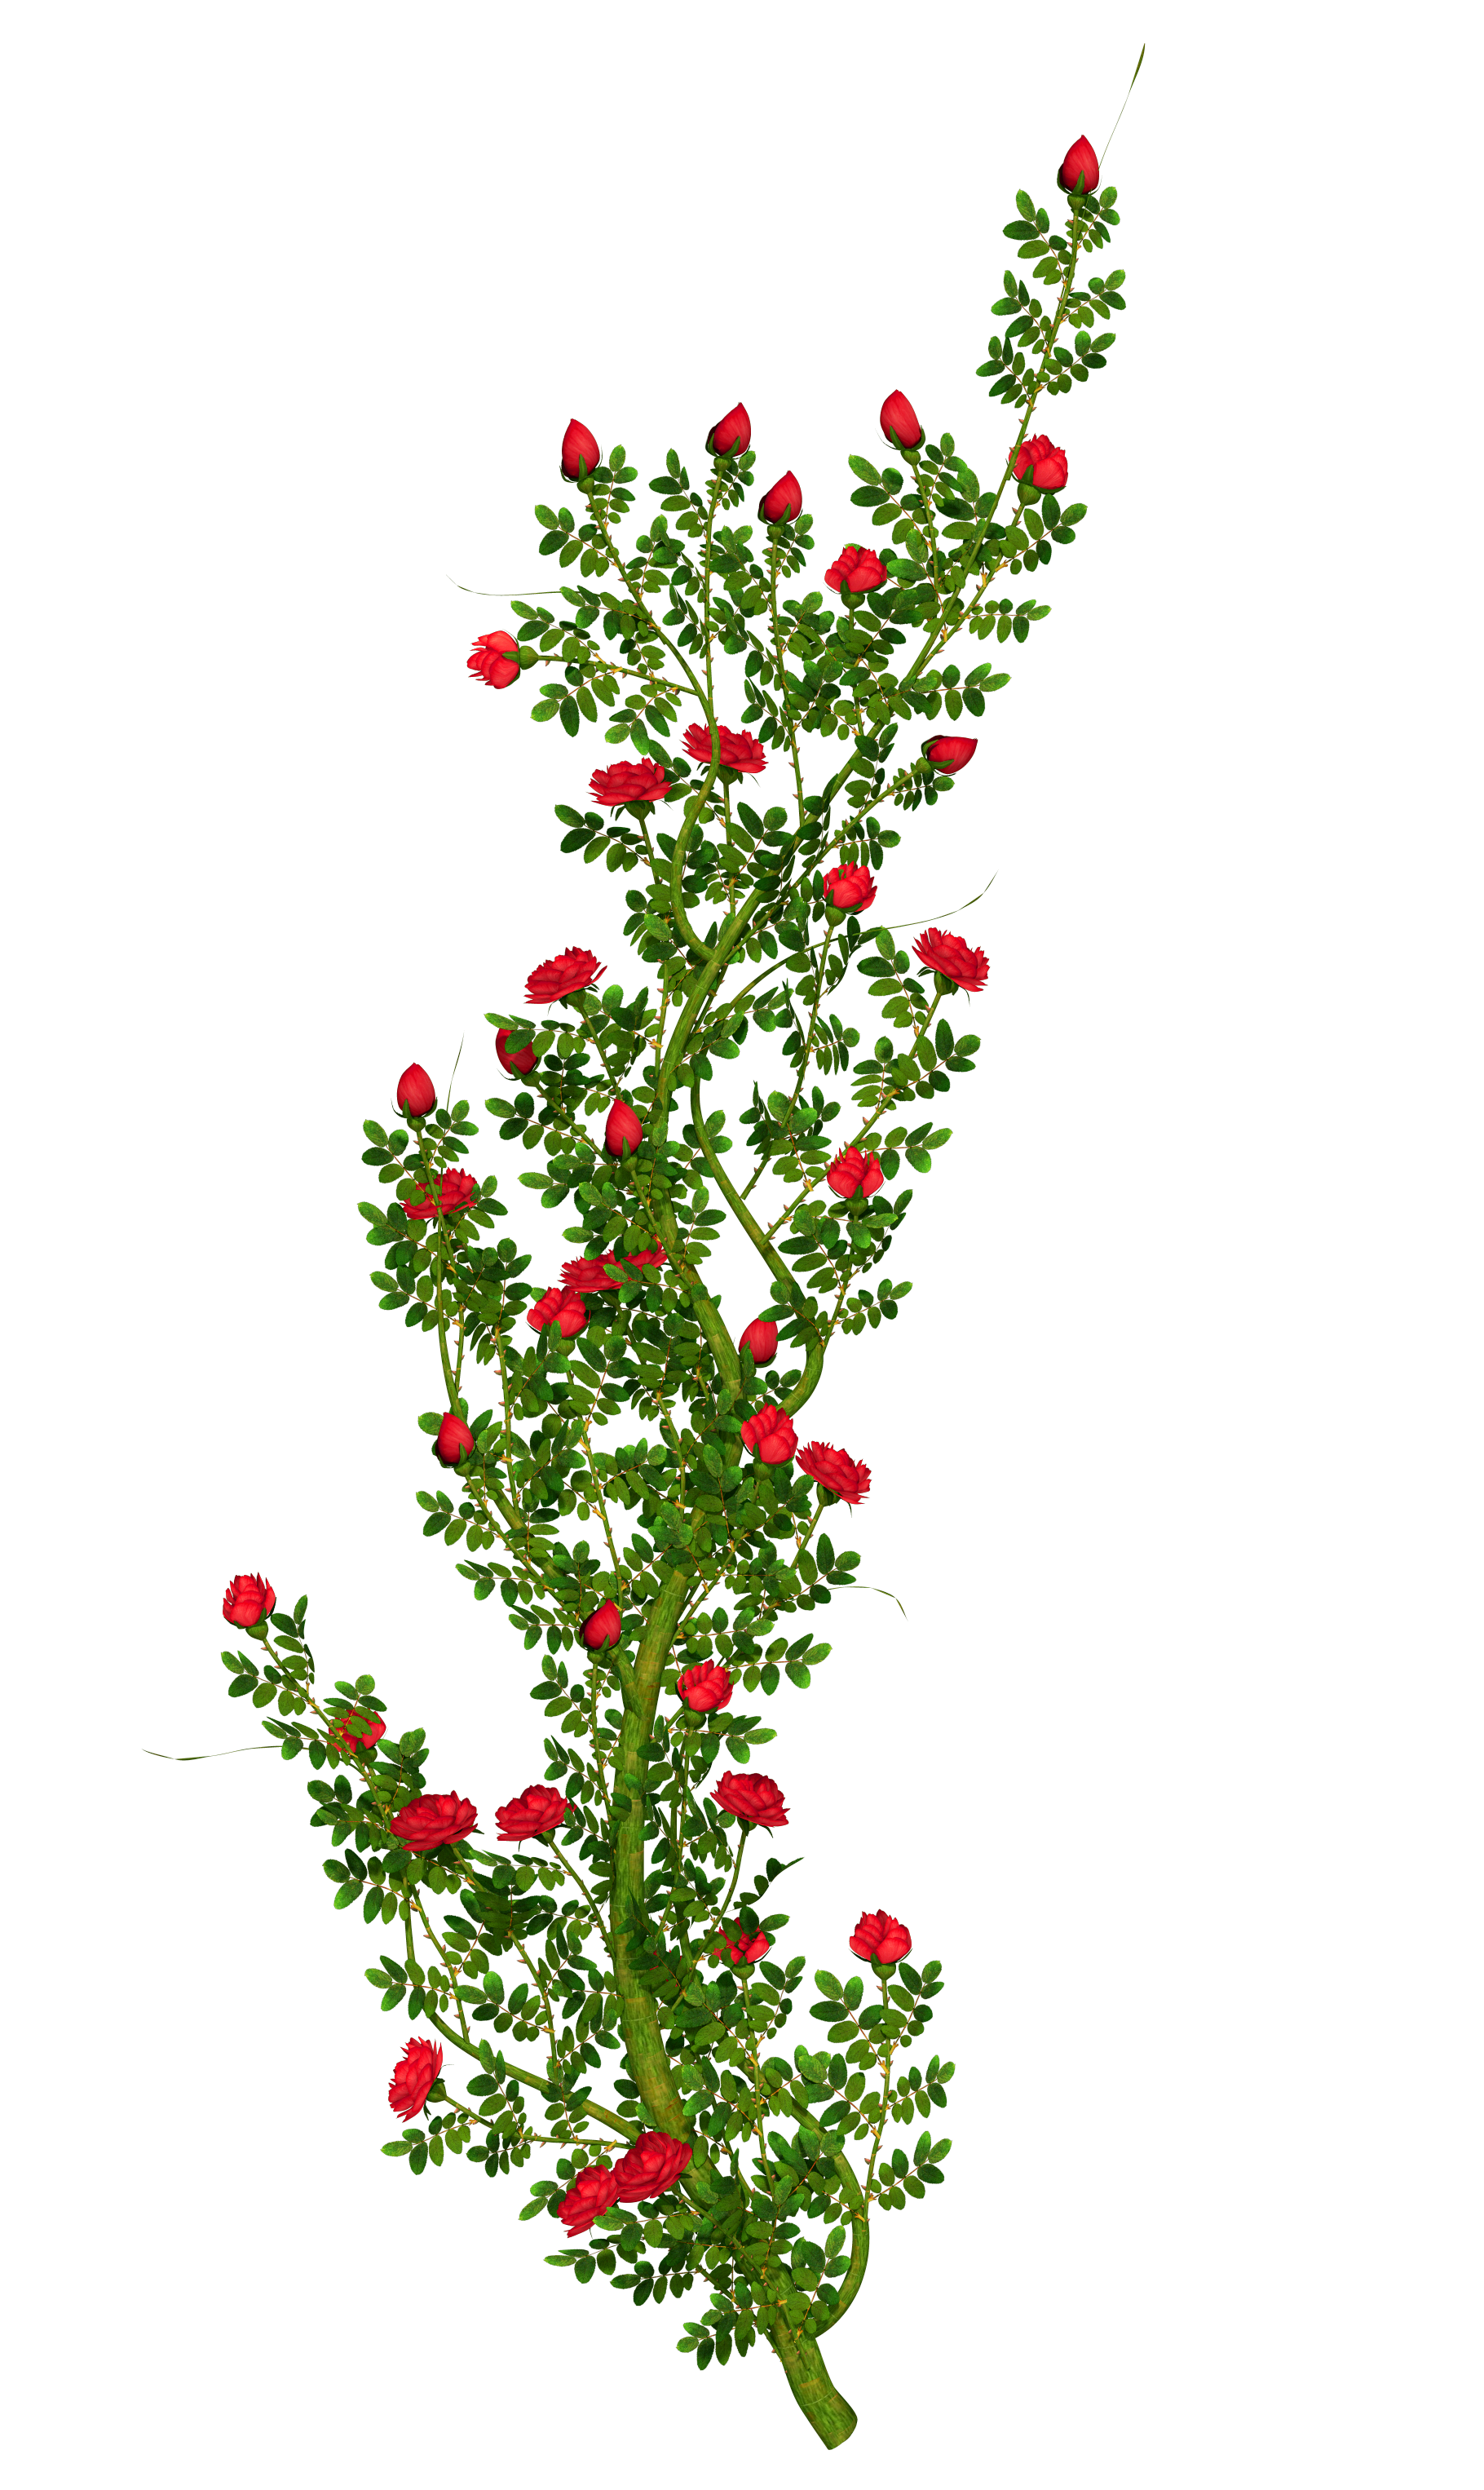 Hawthorn flower clipart clip art royalty free library Rosebush Clipart   Gallery Yopriceville - High-Quality Images and ... clip art royalty free library